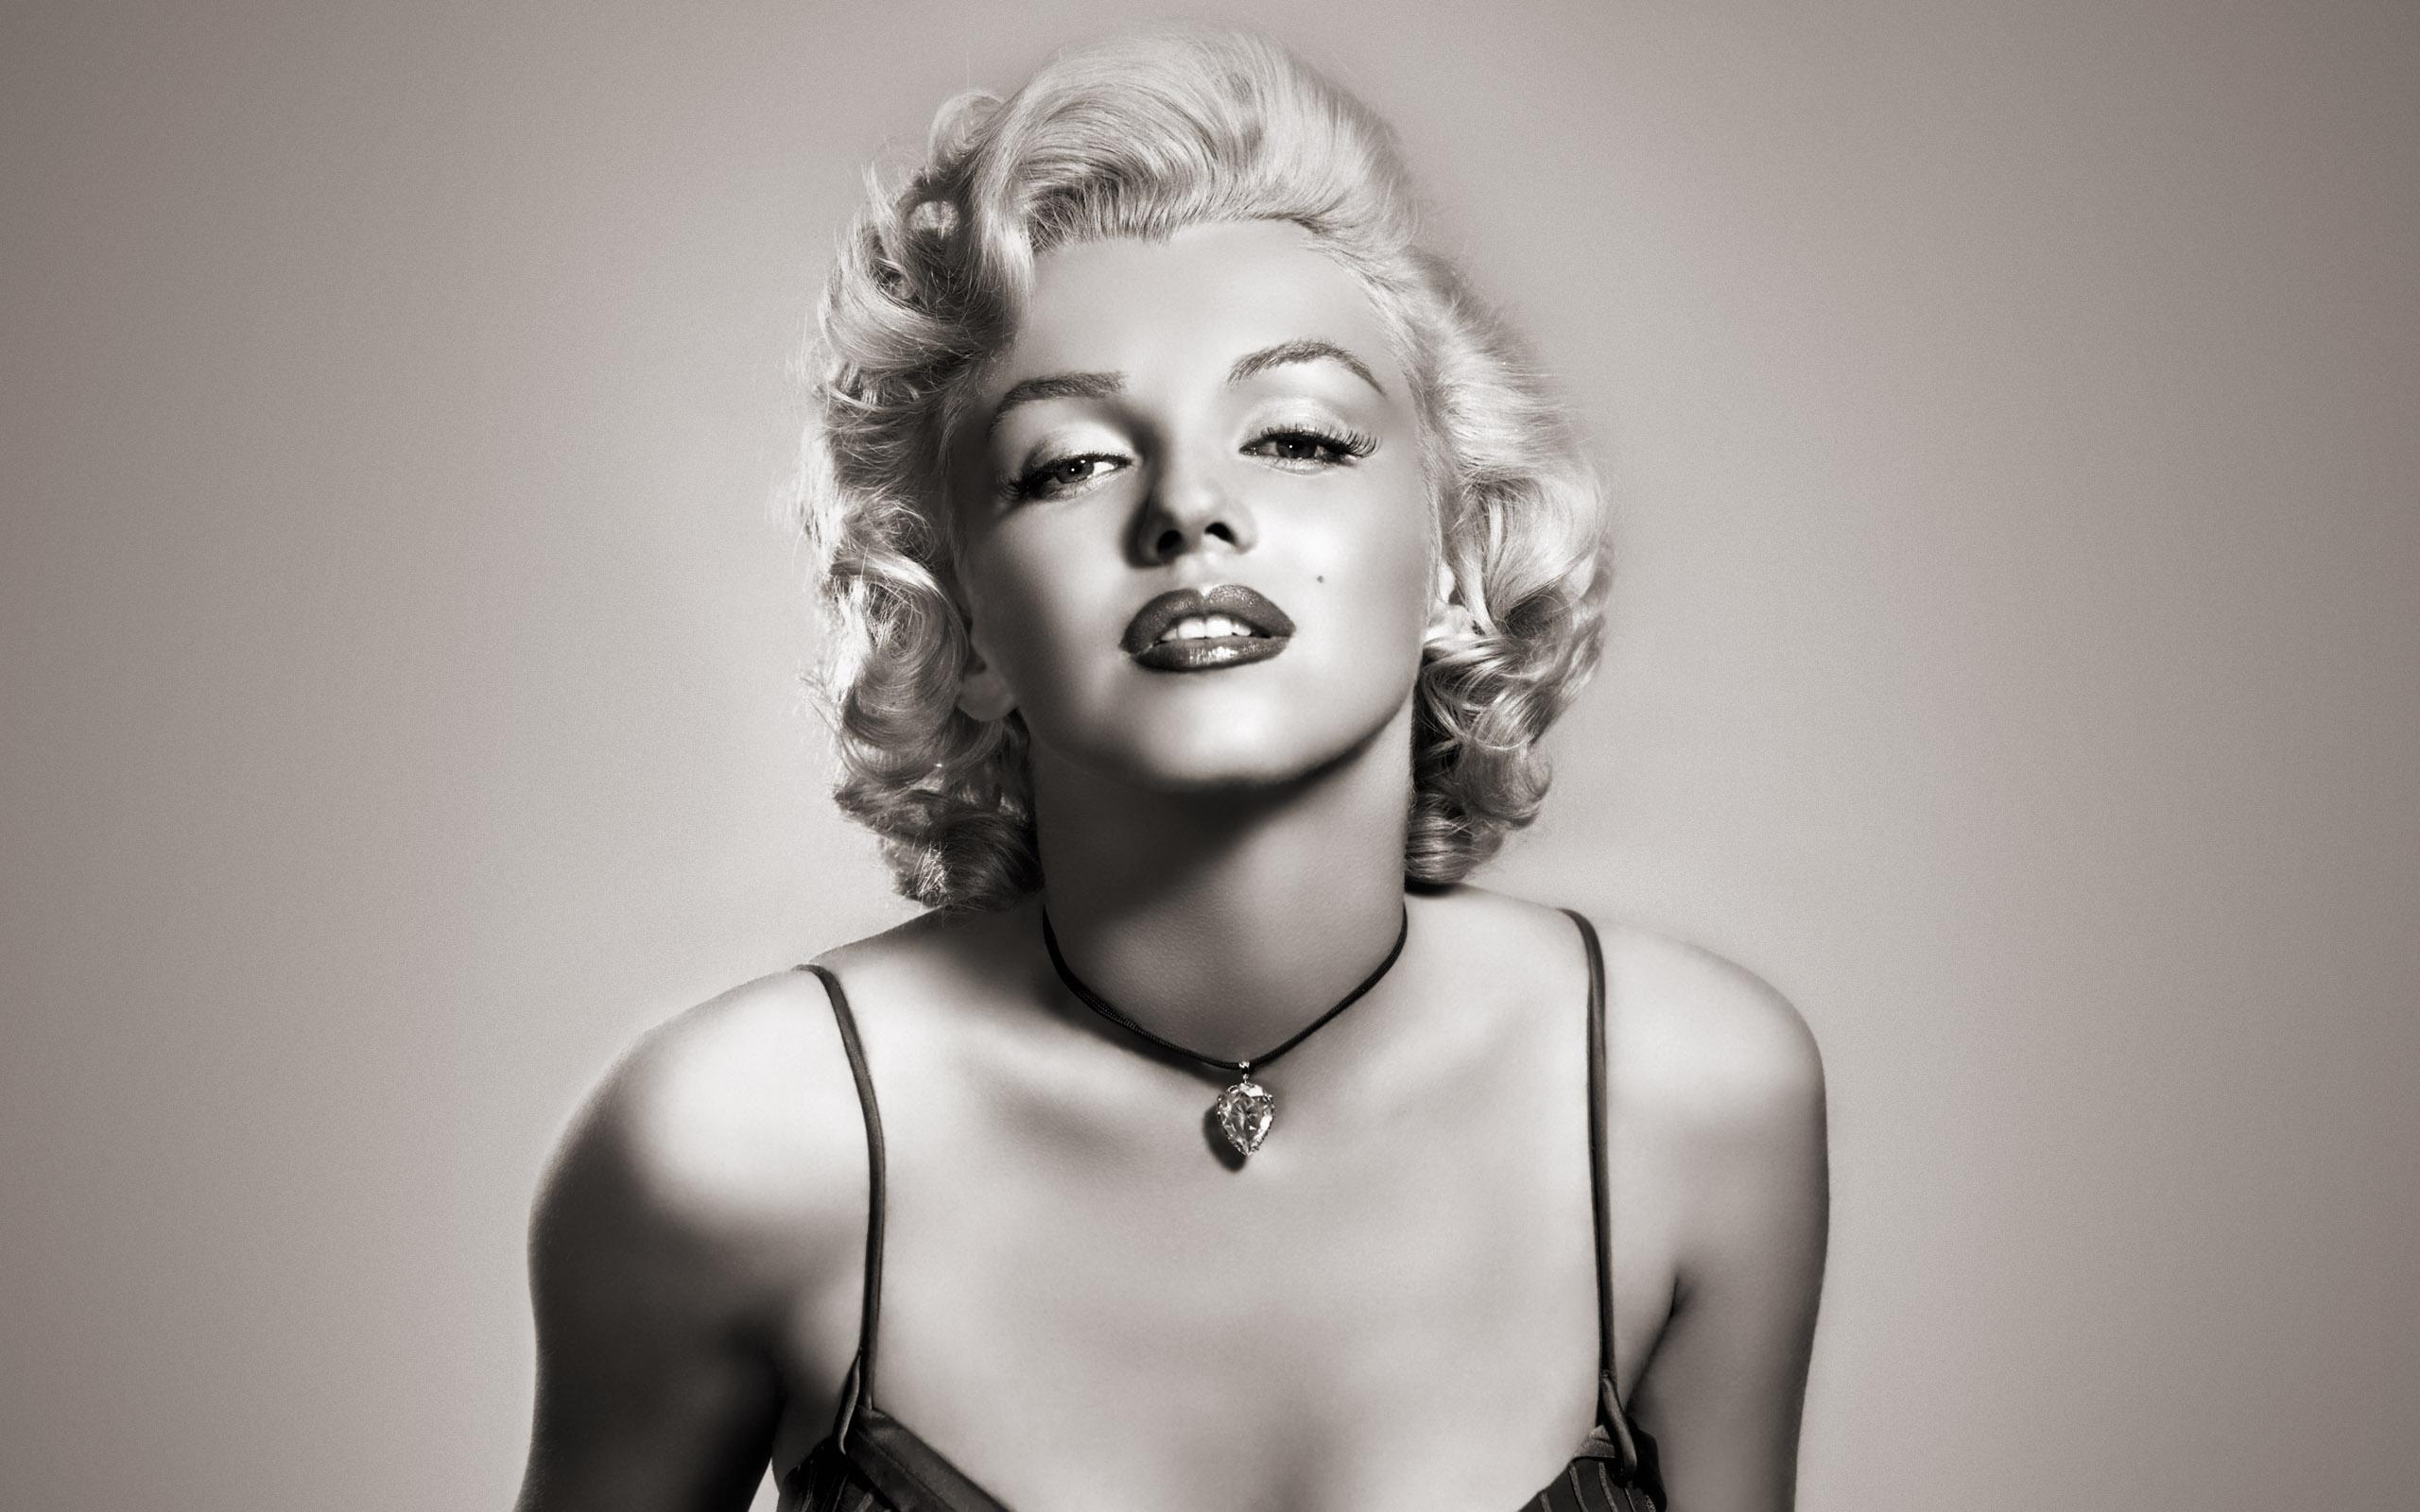 Kendall Jenner Iphone Wallpaper Marilyn Monroe Wallpapers Hd Wallpapers Id 9792